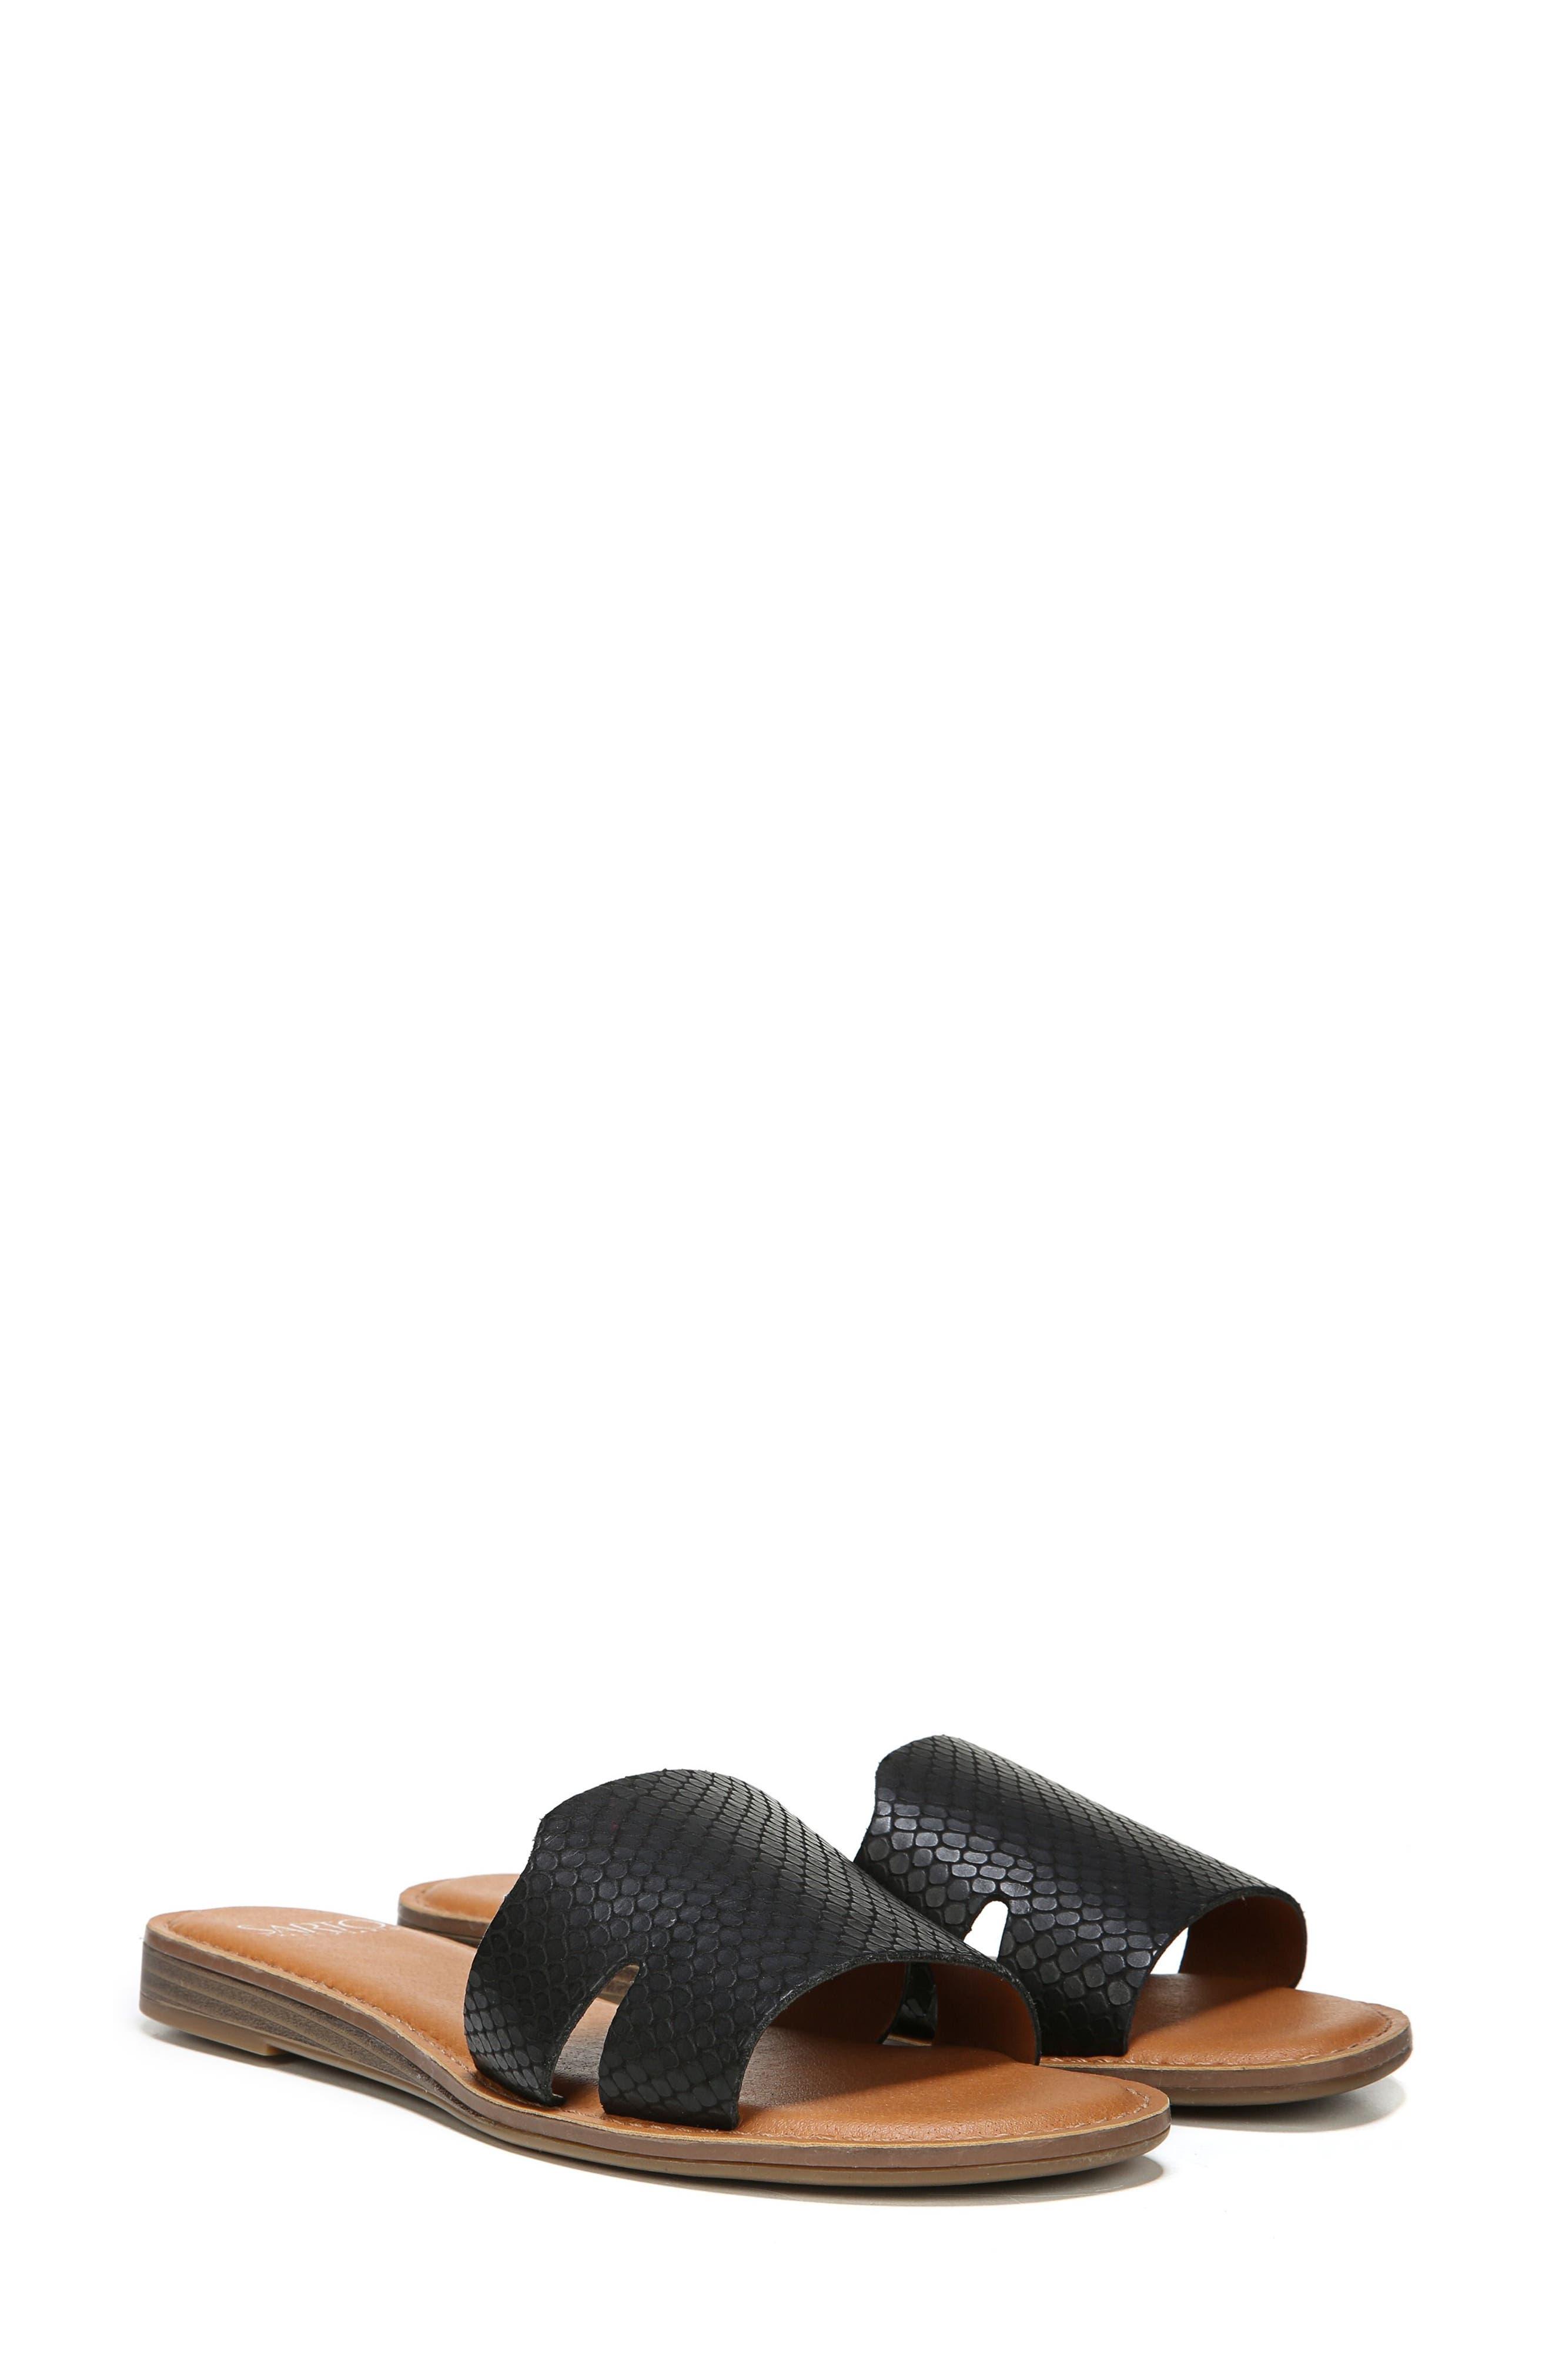 Ginelle Slide Sandal,                             Alternate thumbnail 8, color,                             BLACK PRINTED LEATHER